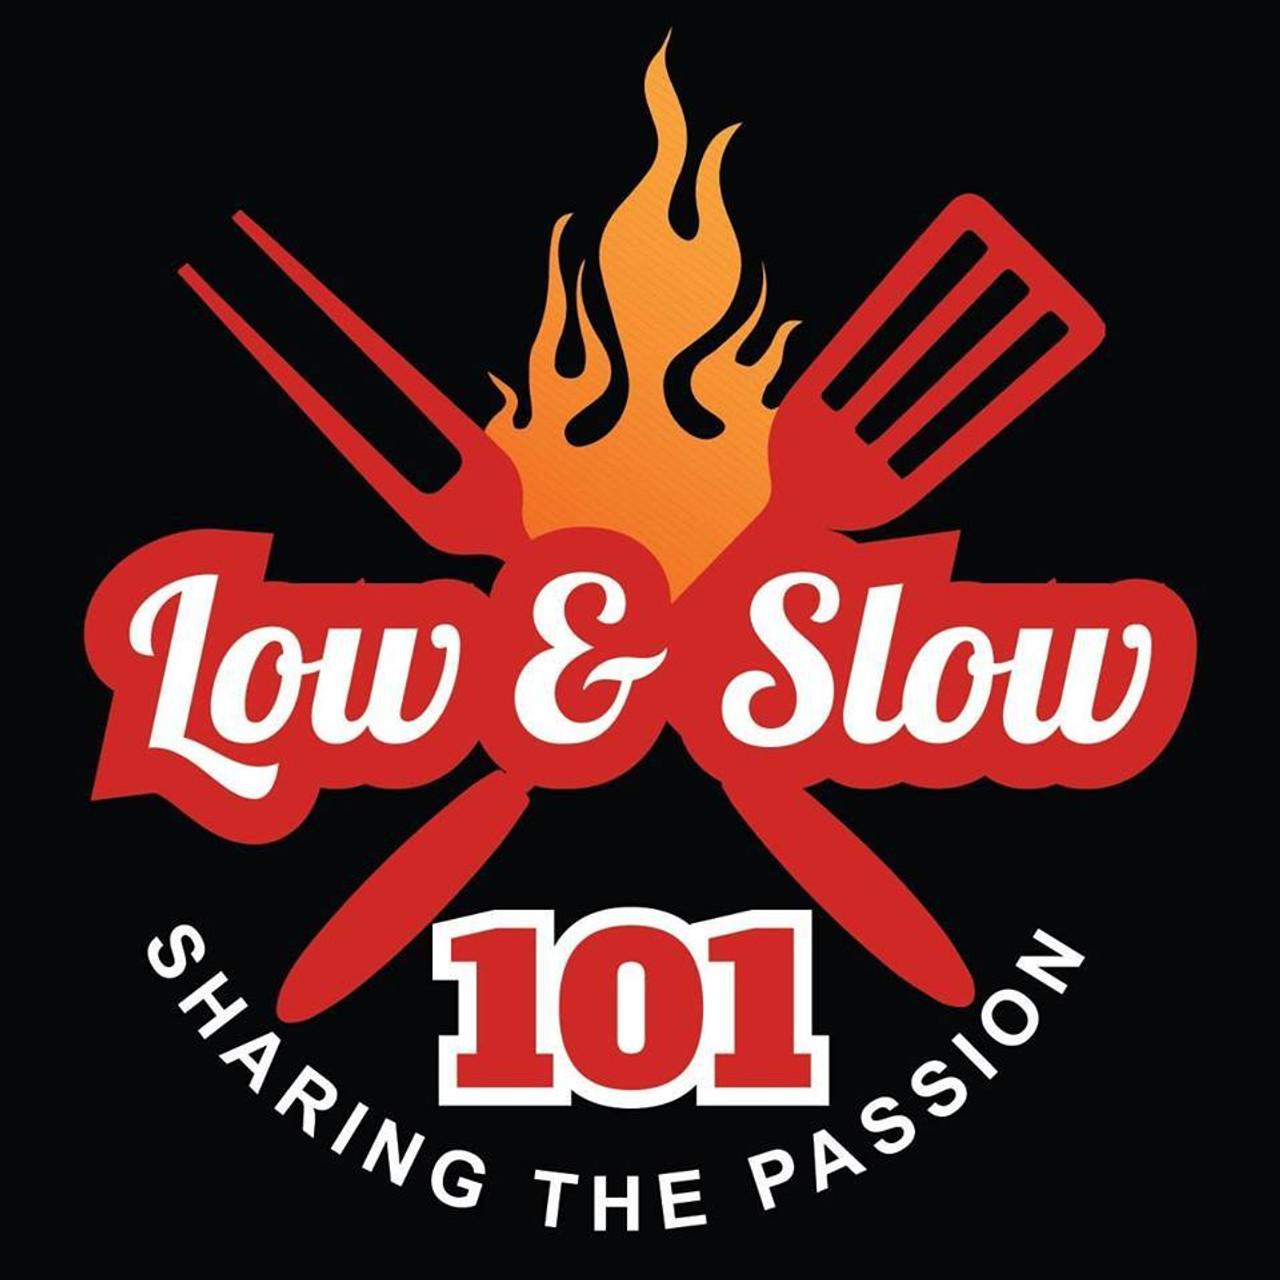 Low & Slow 101, Blend 101 BBQ Rubs